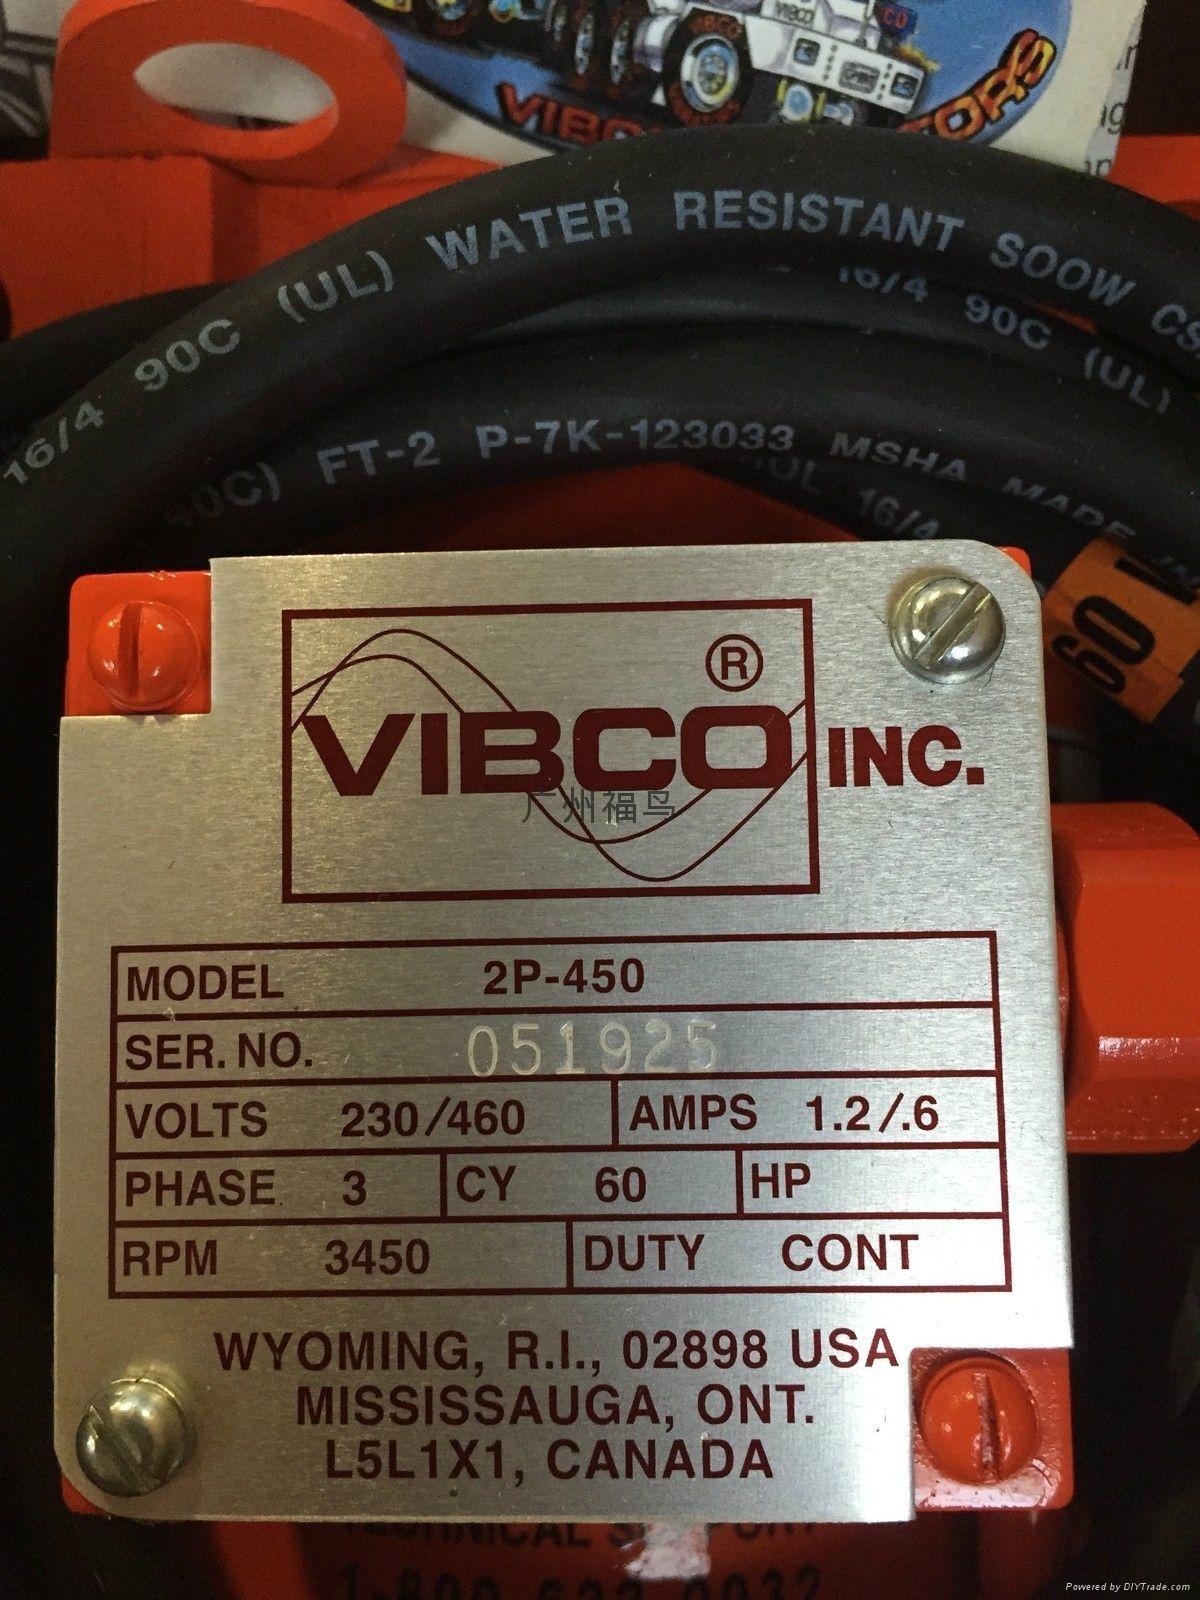 VIBCO振动器, 型号: 2P-450-3